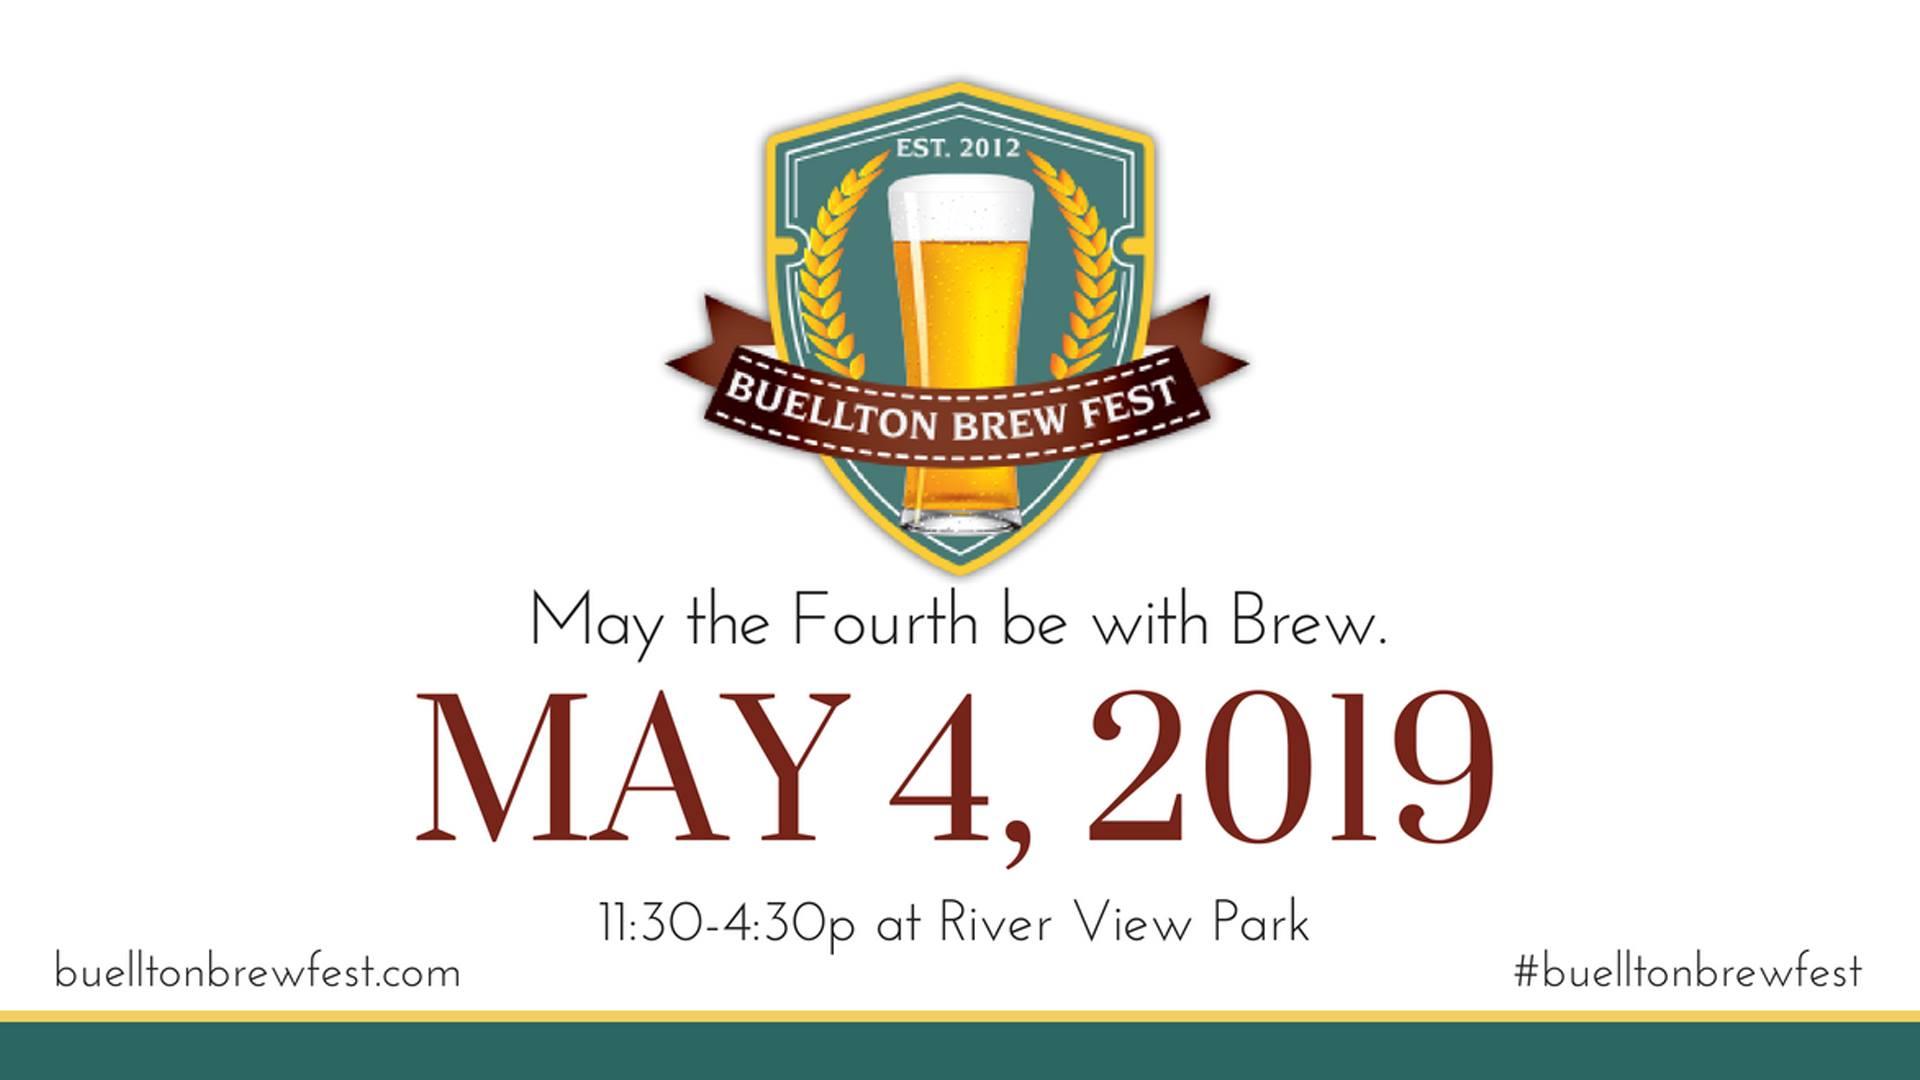 Buellton Brew Fest 2019